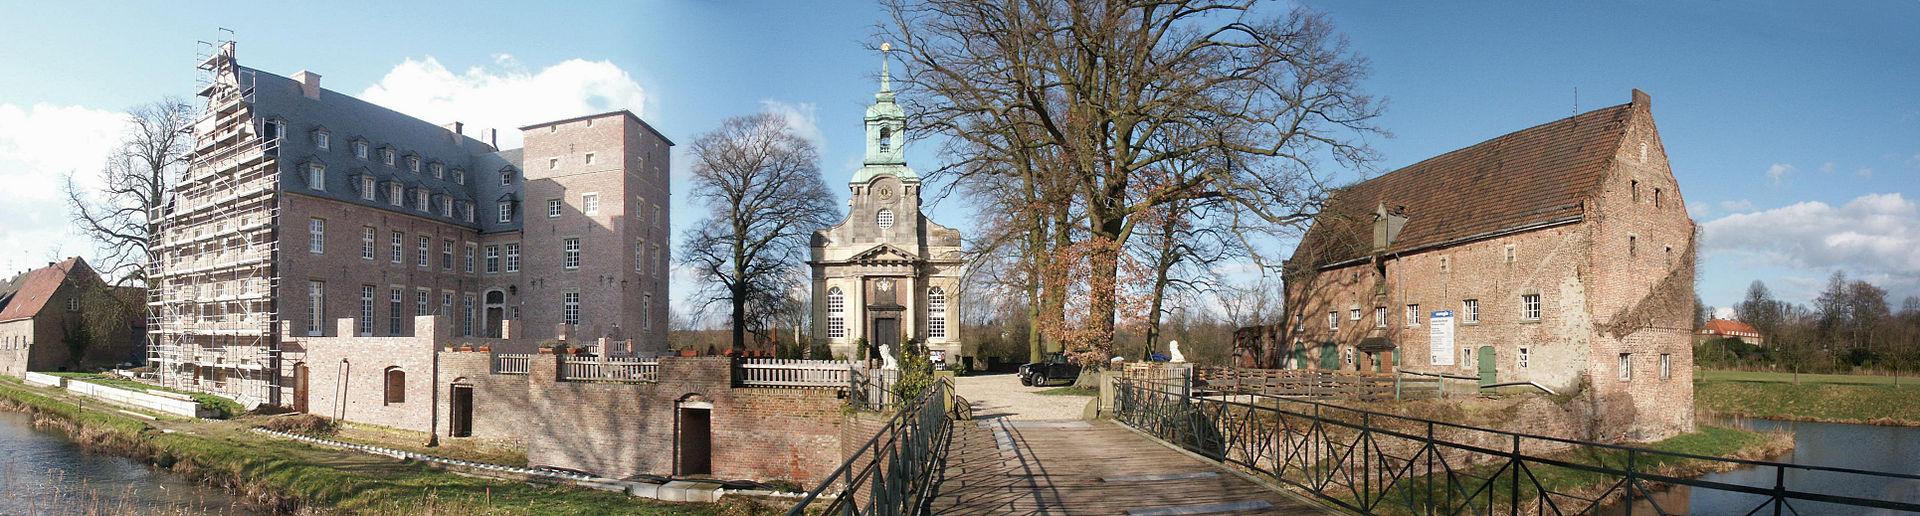 Bild Schloss Diersfordt